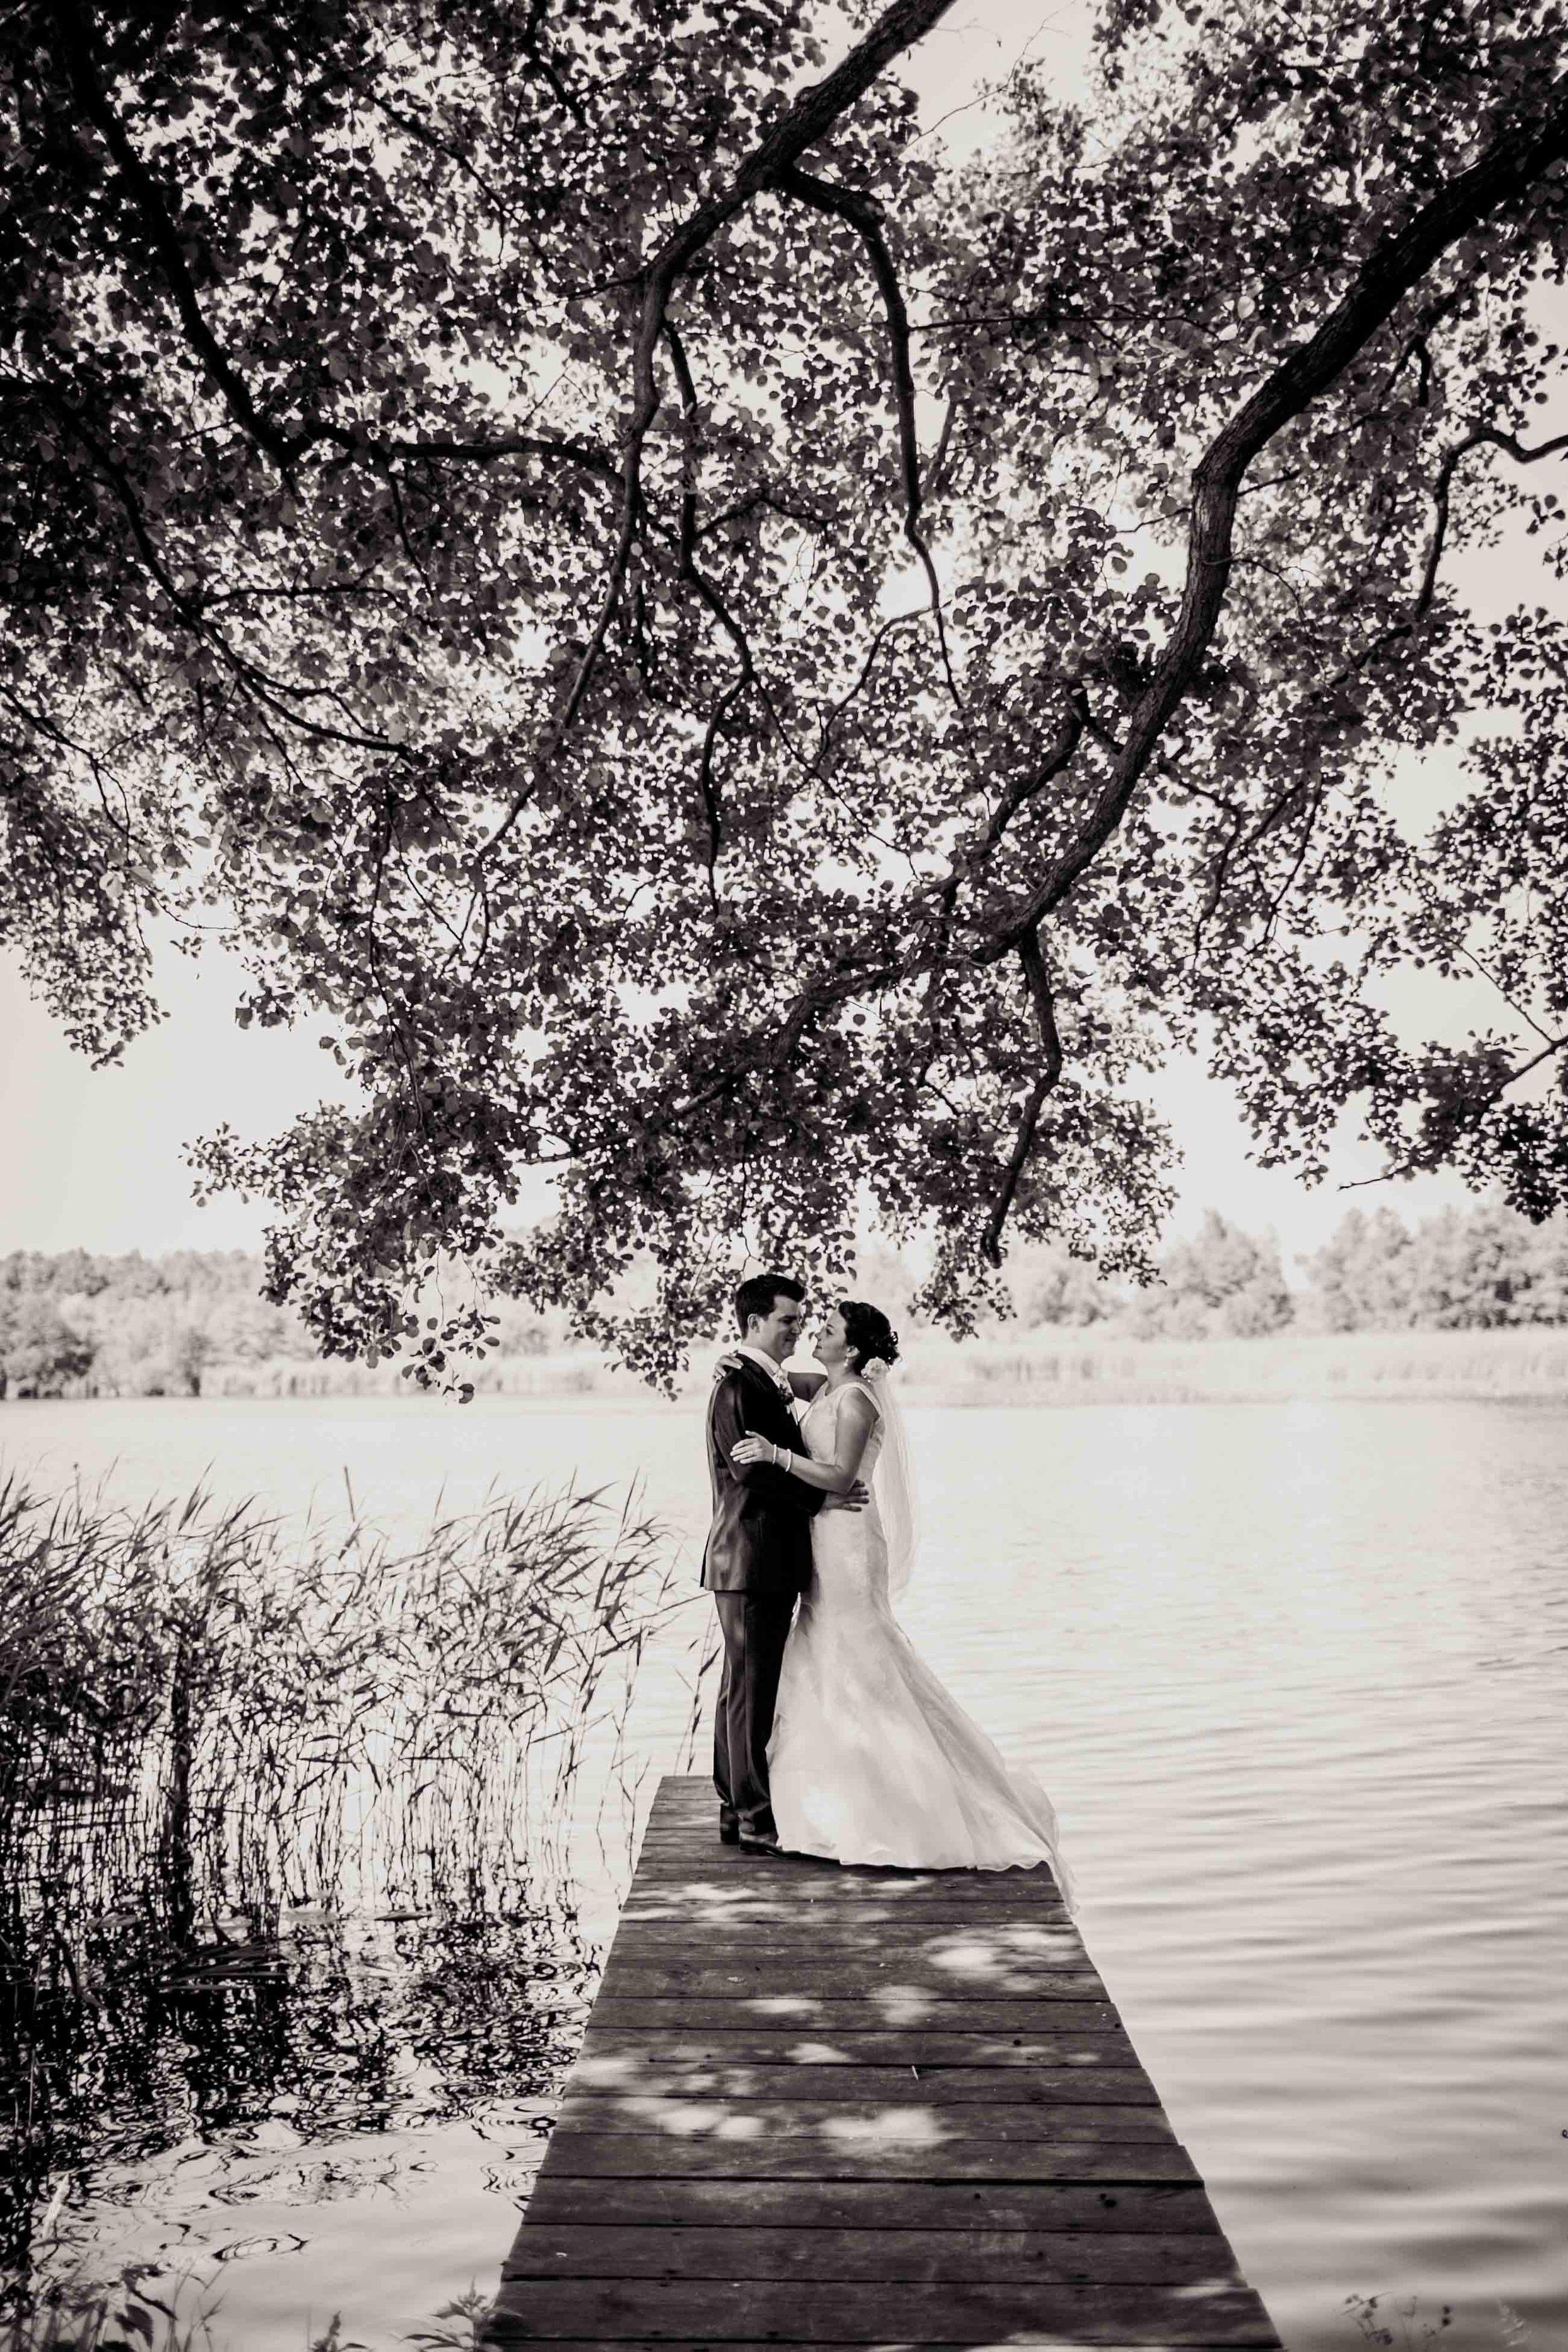 Hochzeitsfotografie Berlin_Fran Burrows Fotografie-229.jpg